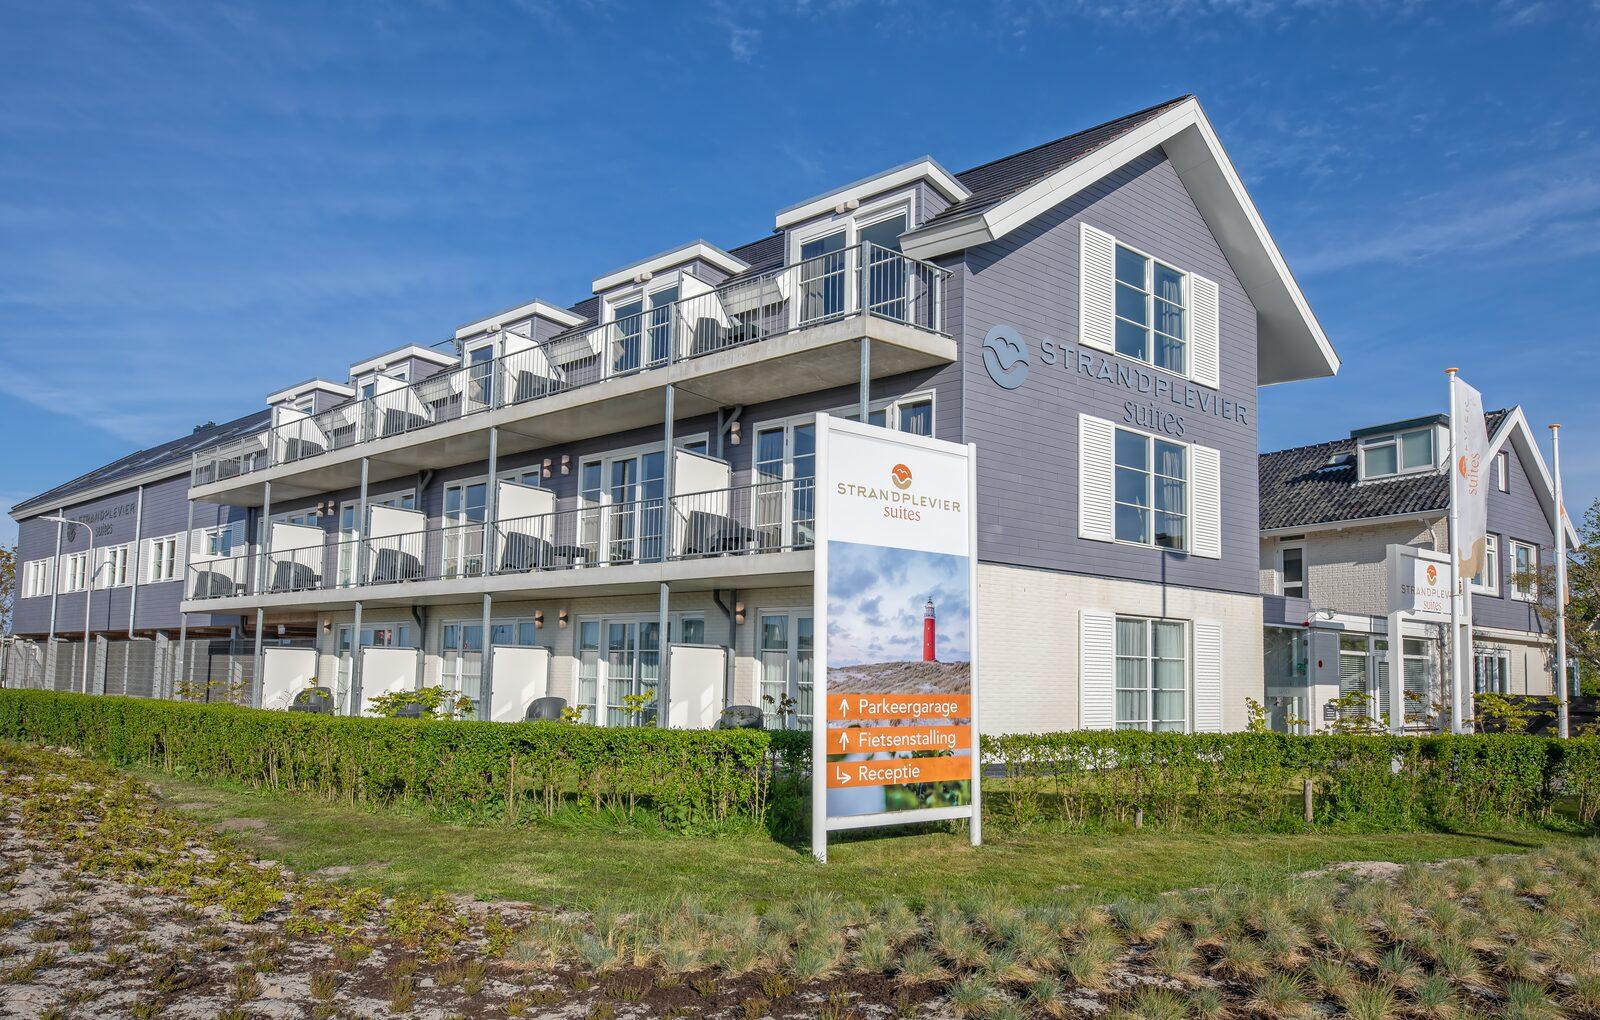 Strandplevier Suites Texel